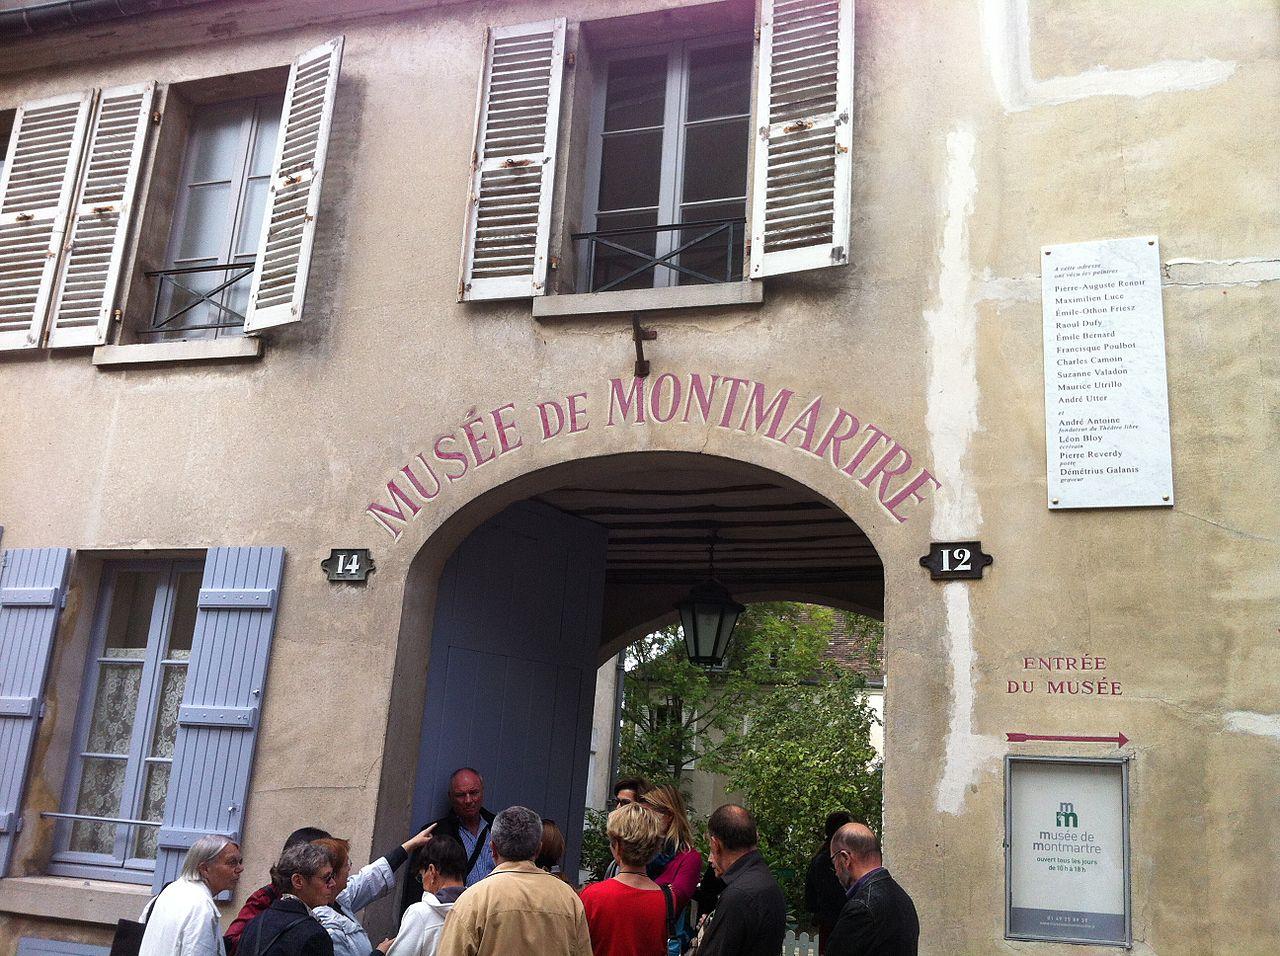 Музей Монмартра, вход